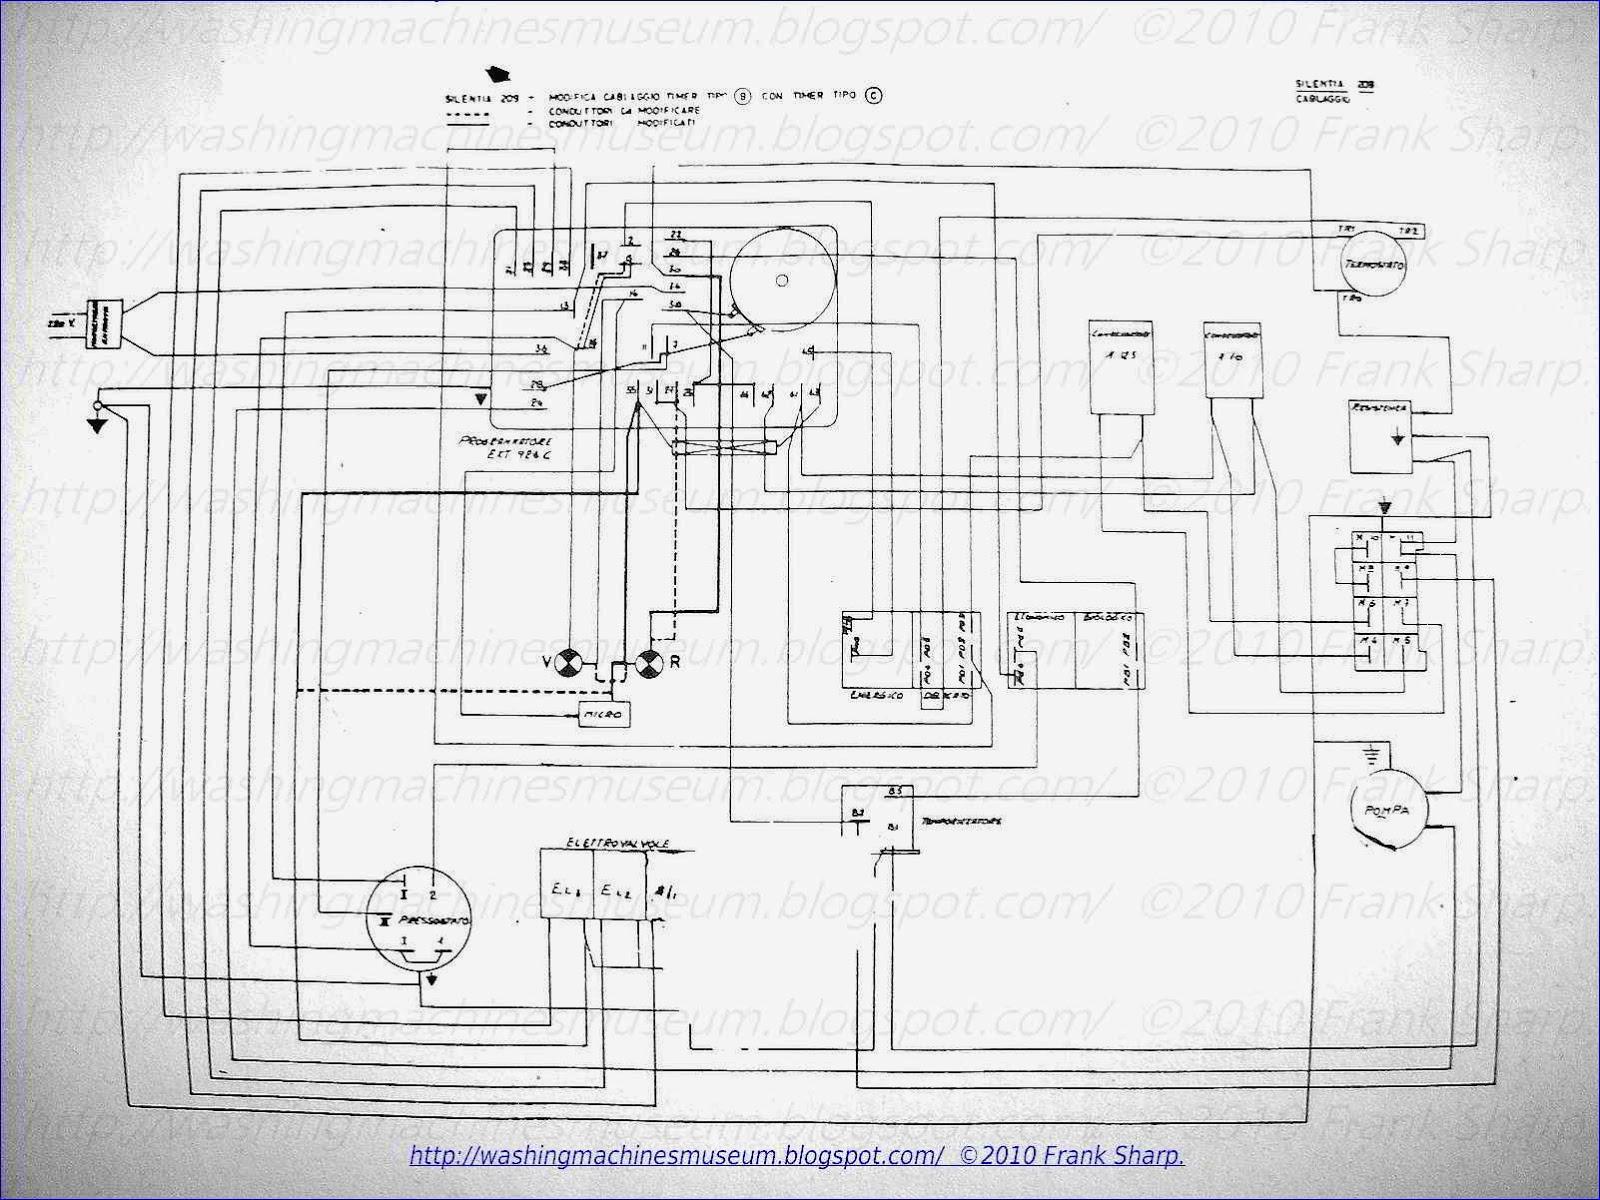 ariston silentia 209 timer mtc sl21 schematic diagram  [ 1600 x 1200 Pixel ]